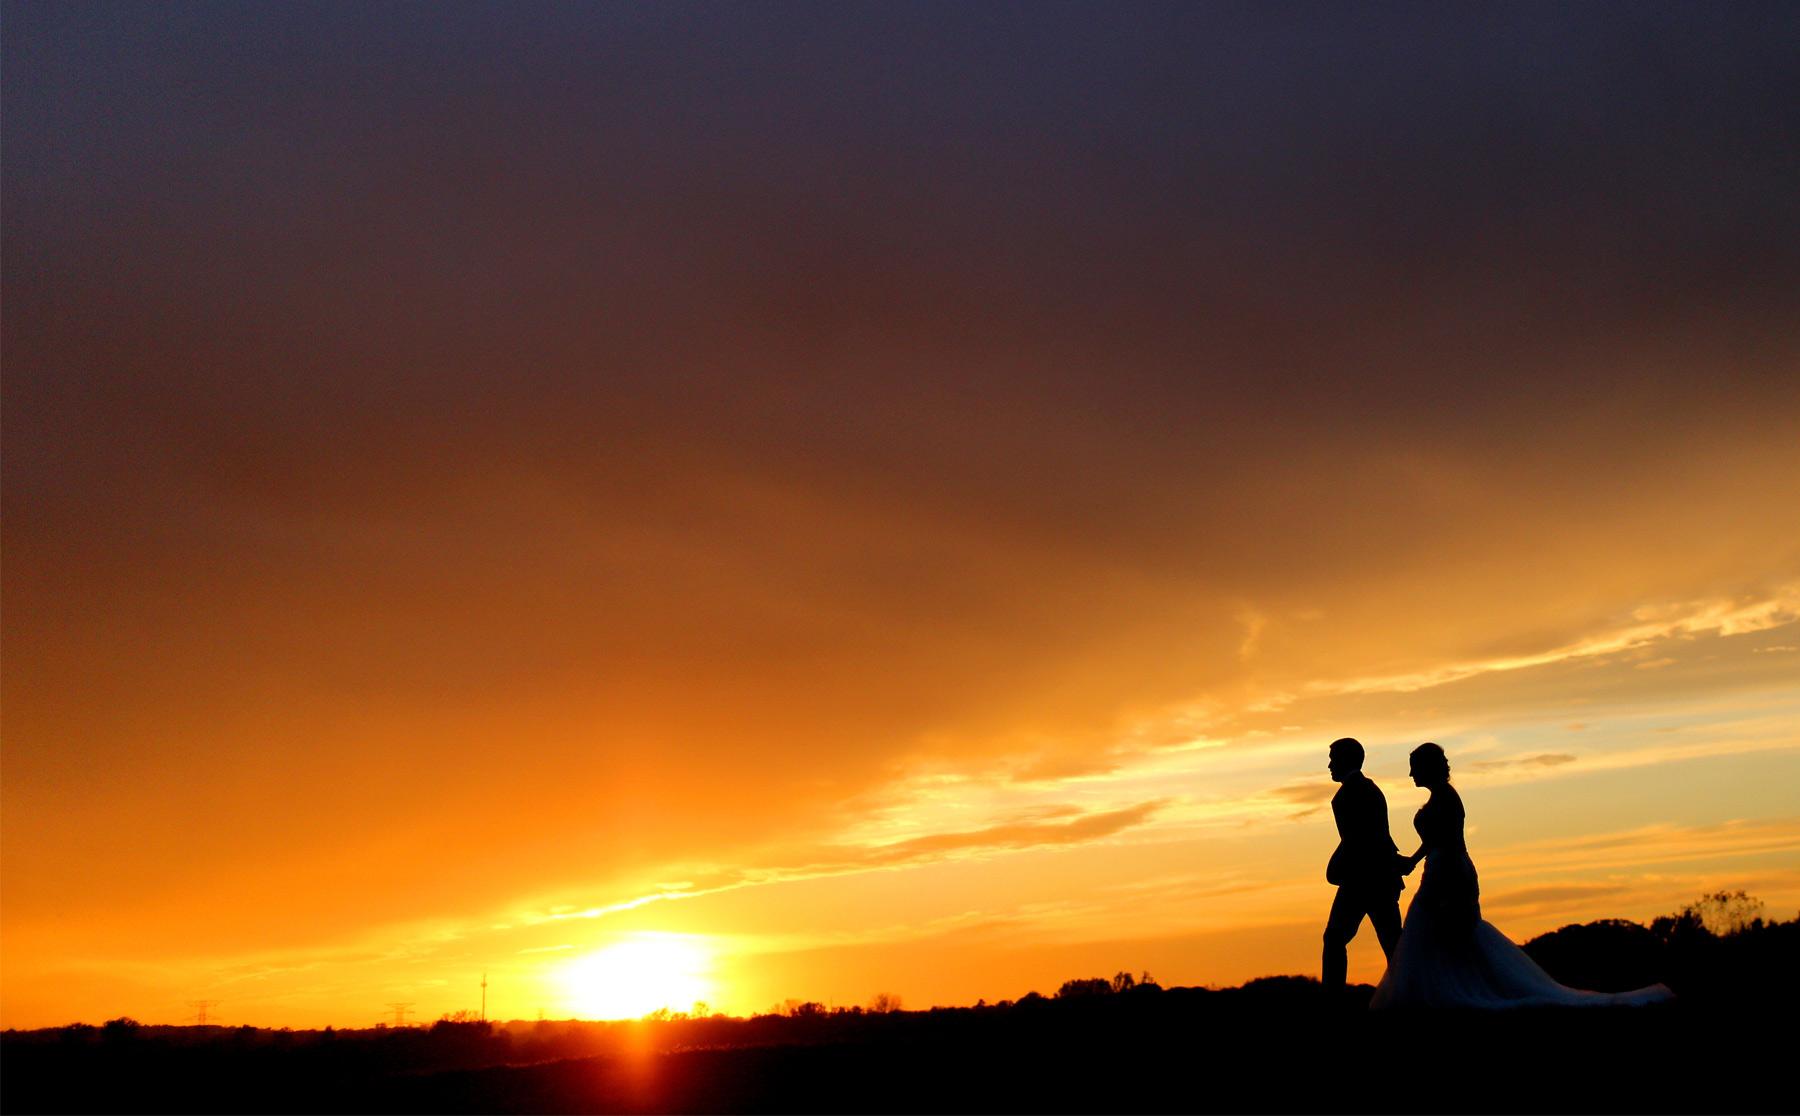 23-Stillwater-Minnesota-Wedding-Photographer-by-Andrew-Vick-Photography-Fall-Autumn-StoneRidge-Golf-Club-Bride-Groom-Silhouette-Sunset-Sunflare-Micaela-and-Derek.jpg